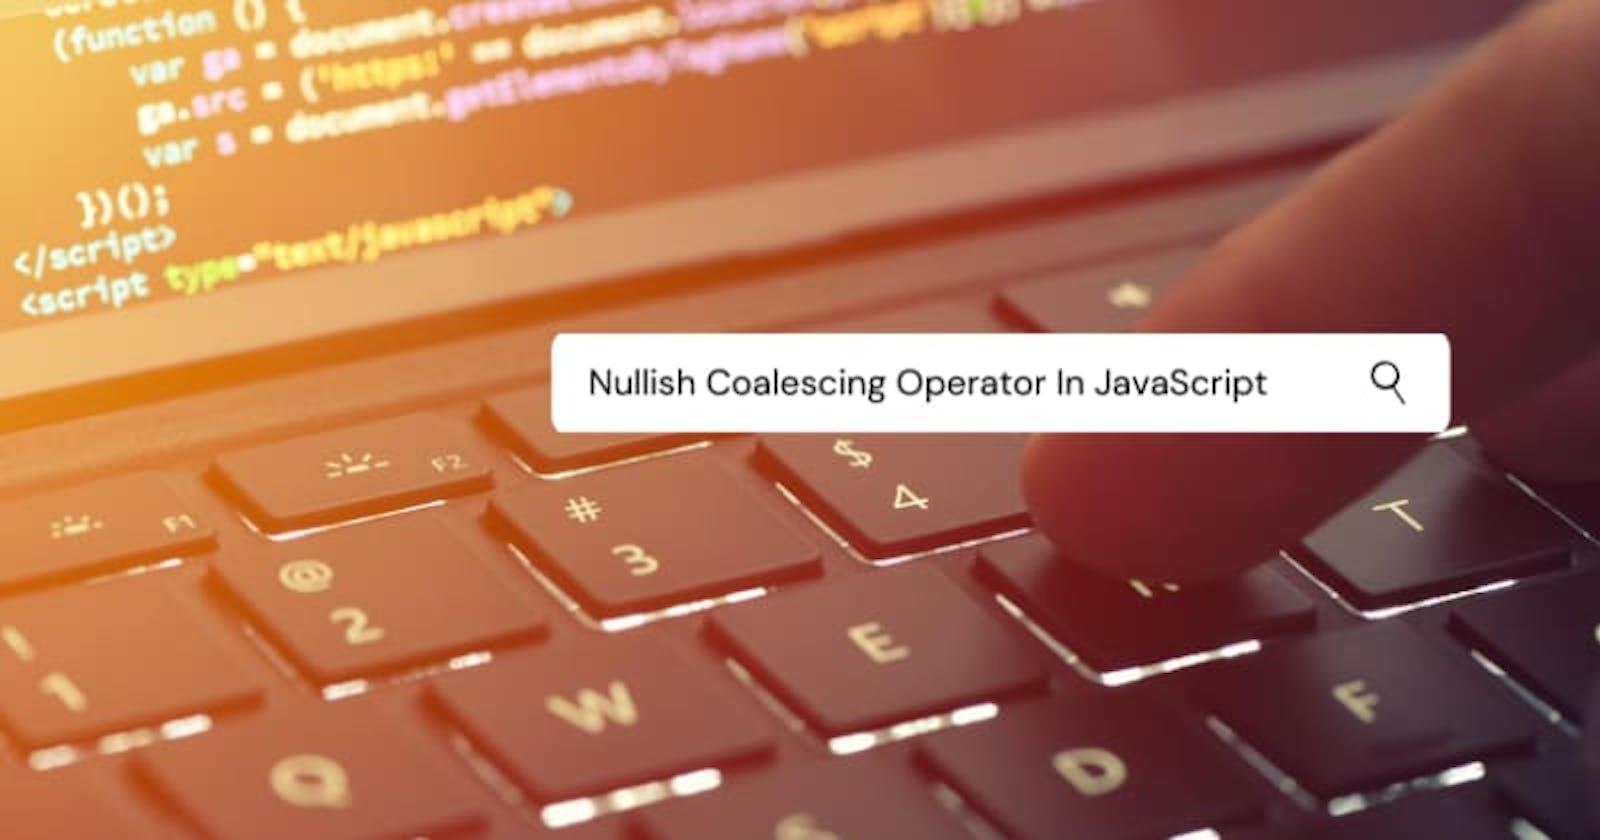 Nullish Coalescing Operator (??) In JavaScript